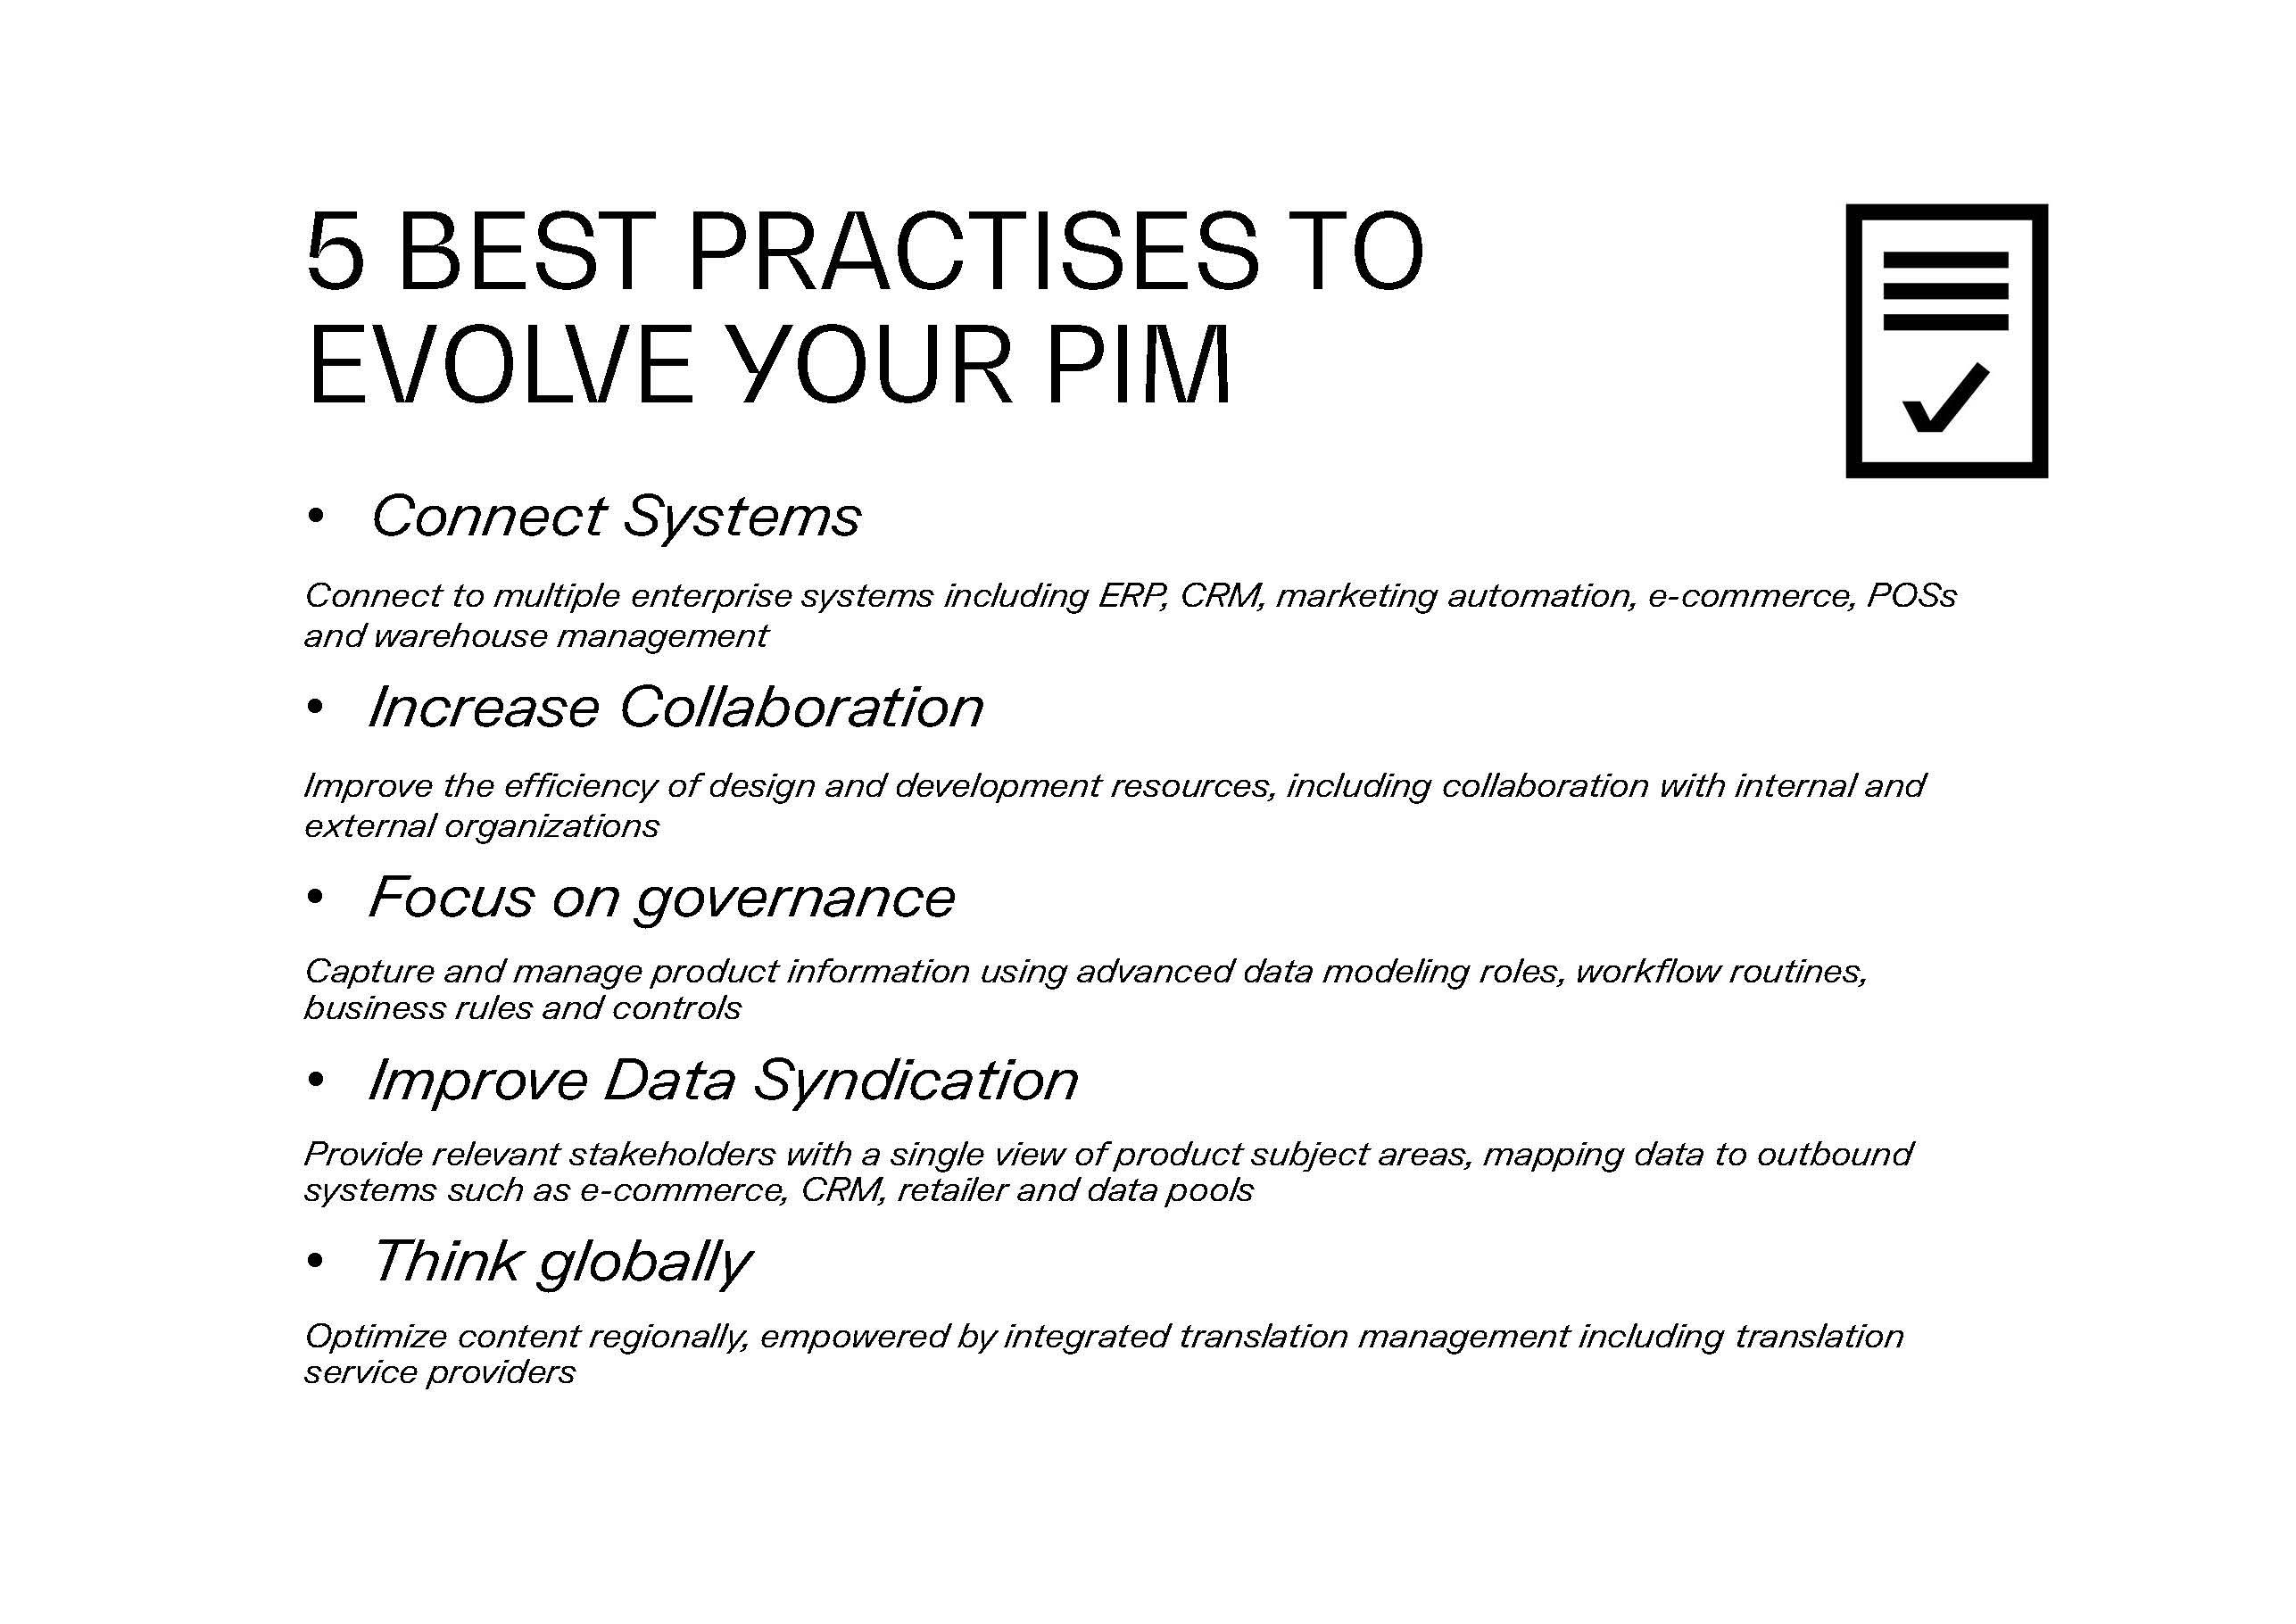 5 ways to evolve your PIM-2